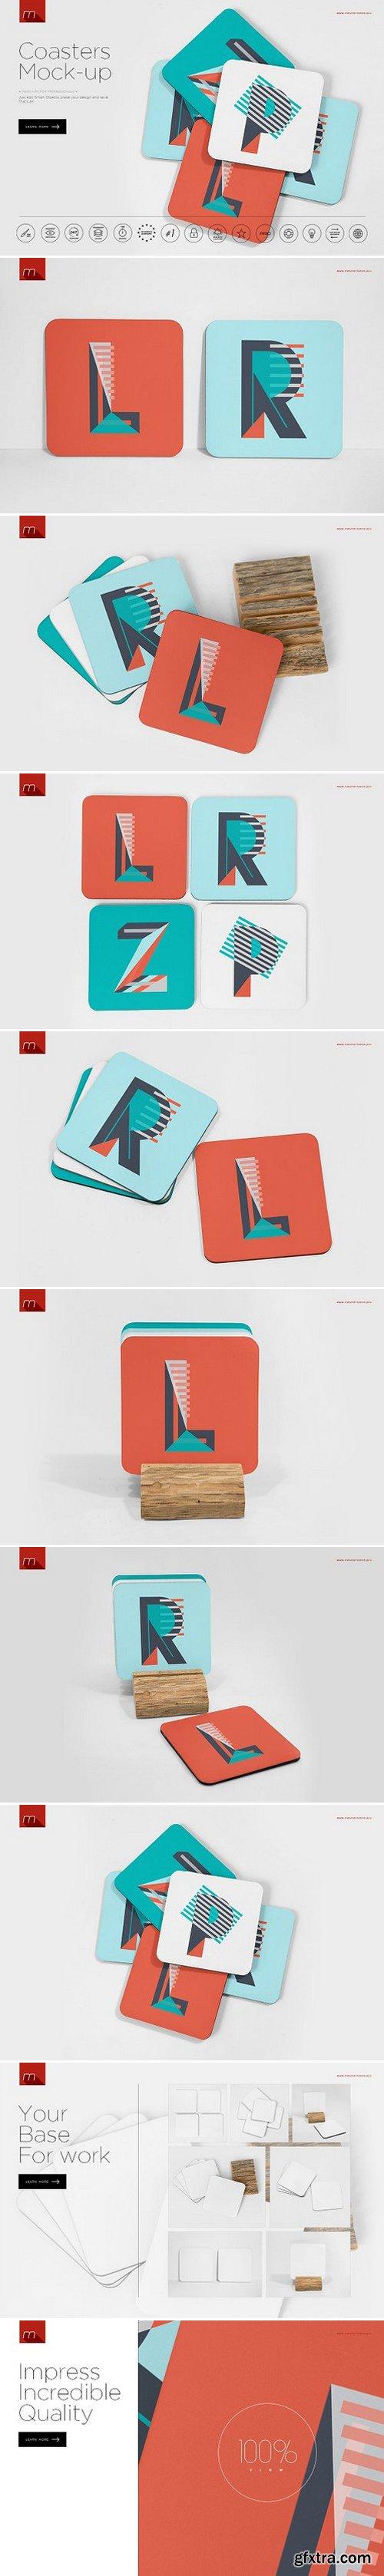 CM - Coasters Mock-up 1082244